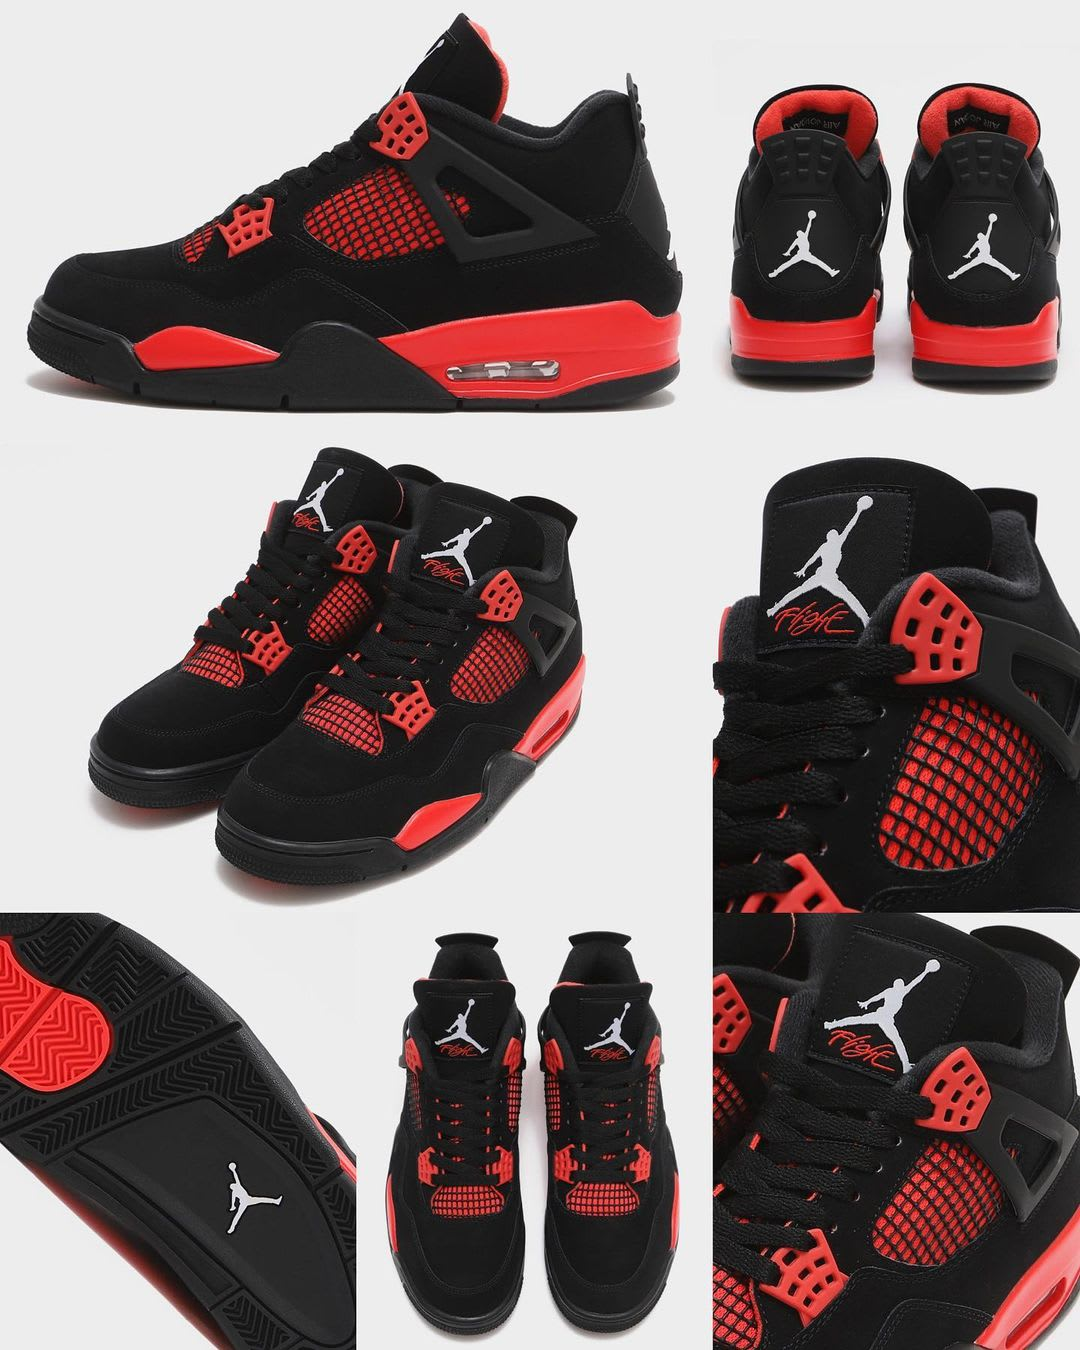 Air Jordan 4 Retro 'Red Thunder' CT8527-016